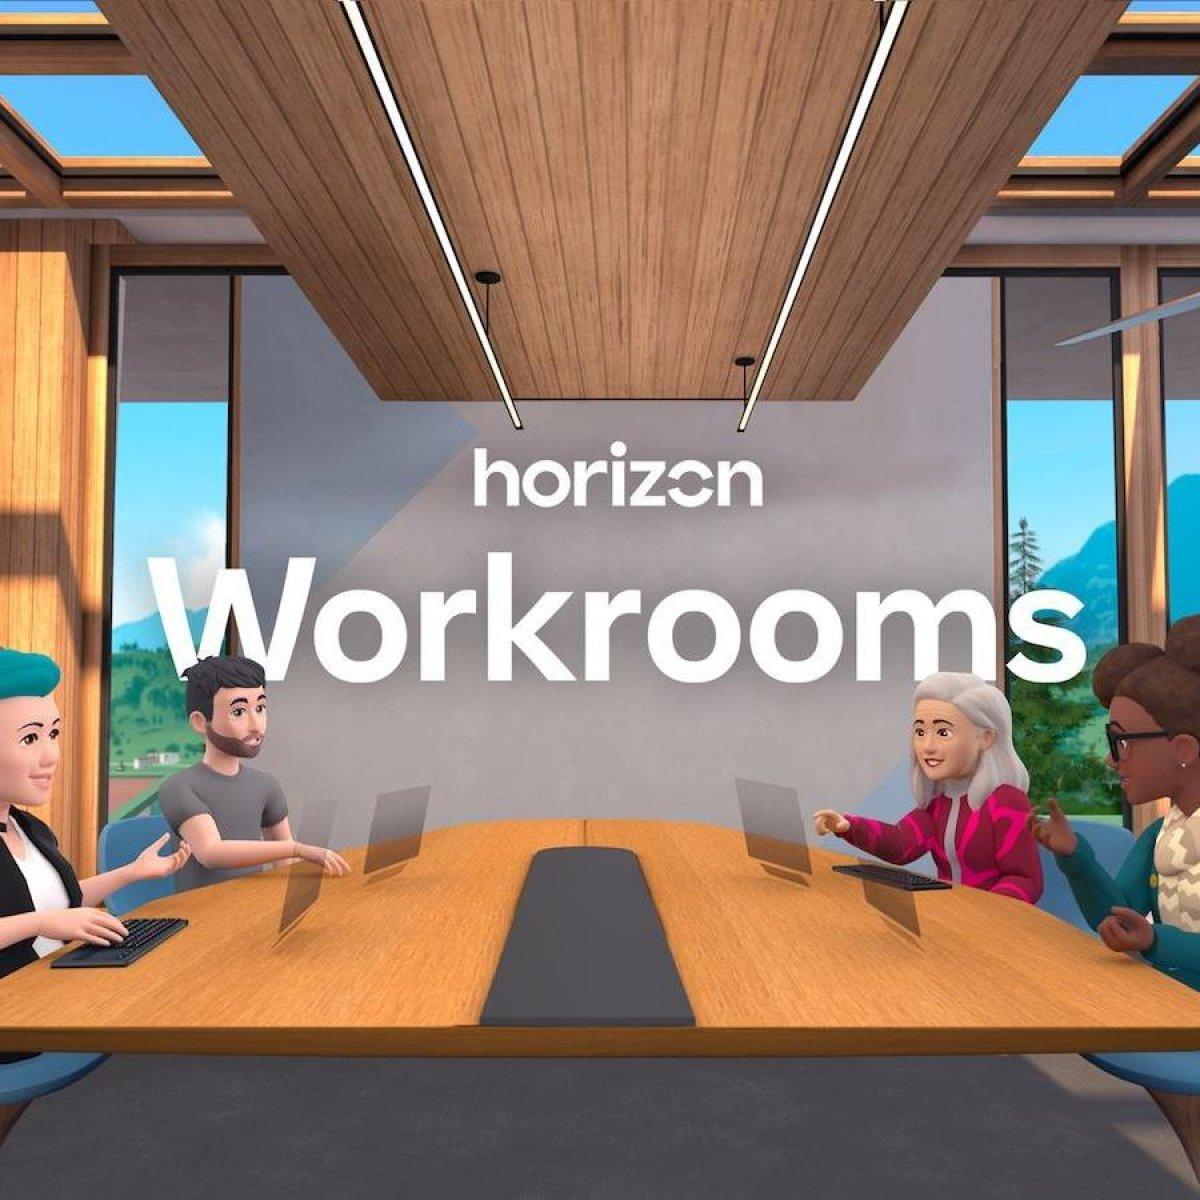 Facebook tan sanal ofis: Horizon Workrooms #1